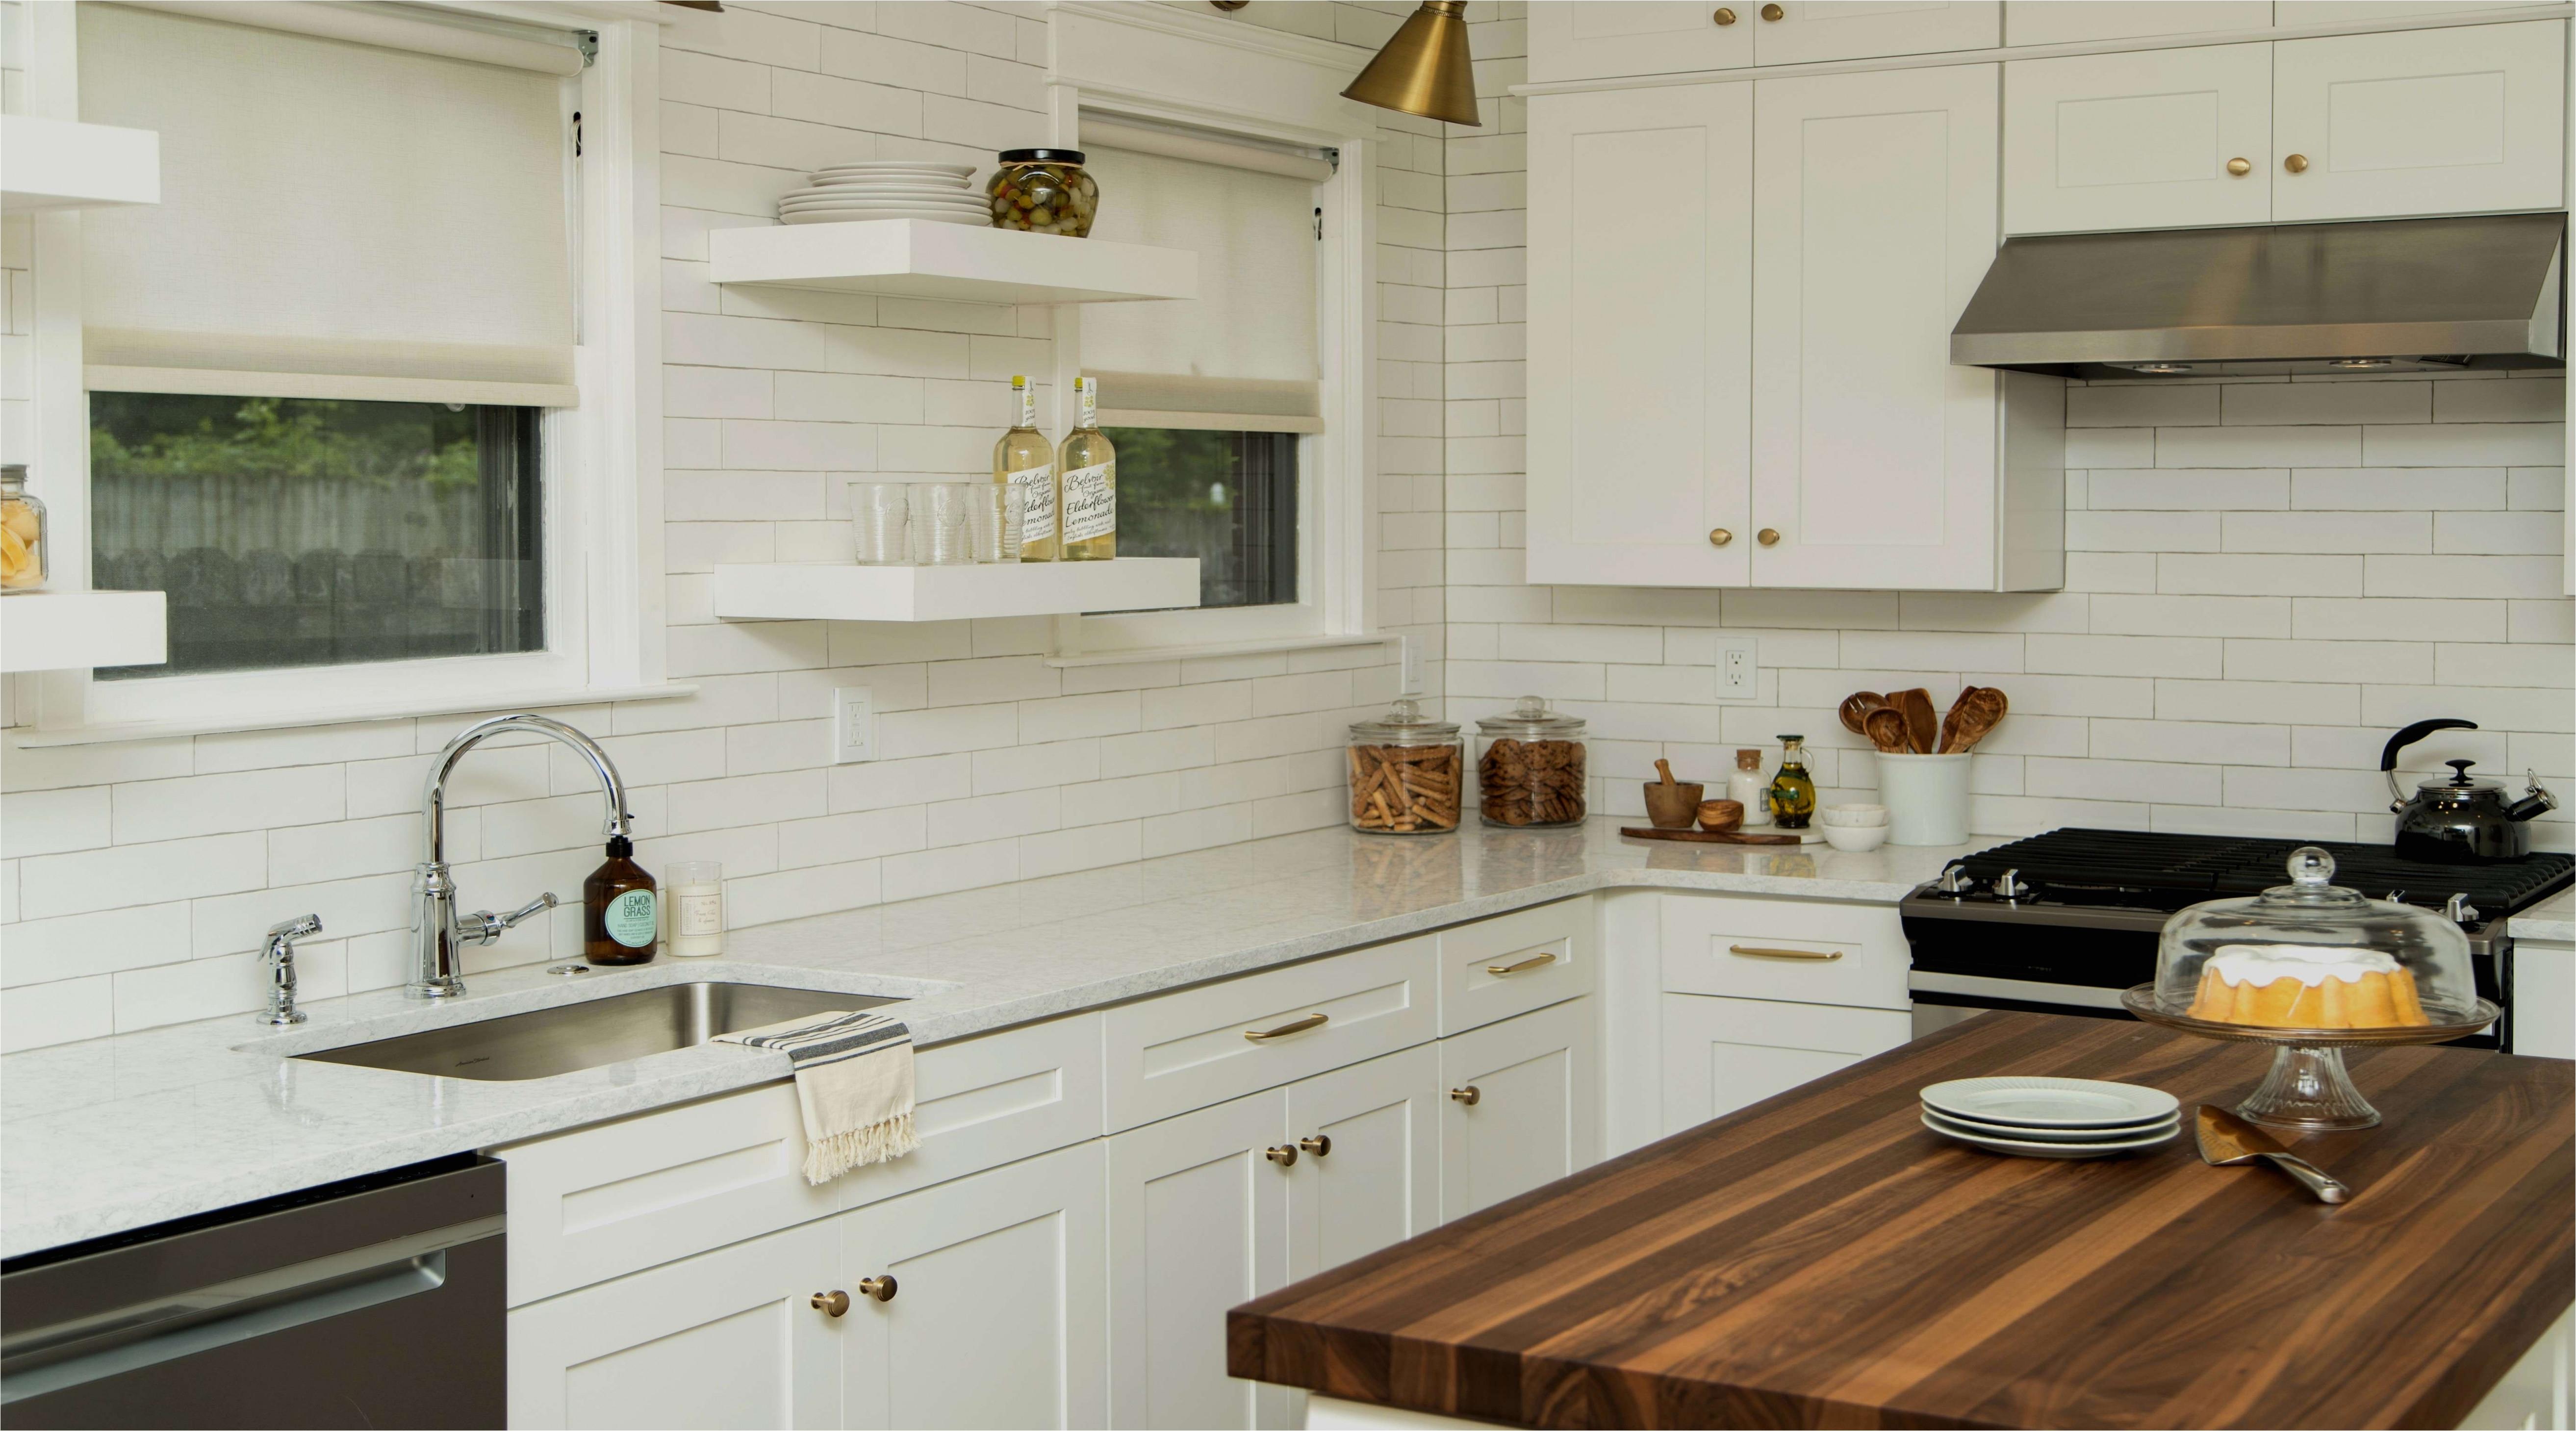 Diy Kitchen Cabinets Plans Inspirational Diy Outdoor Kitchen Best Media Cache Ak0 Pinimg 750x 8b 0d